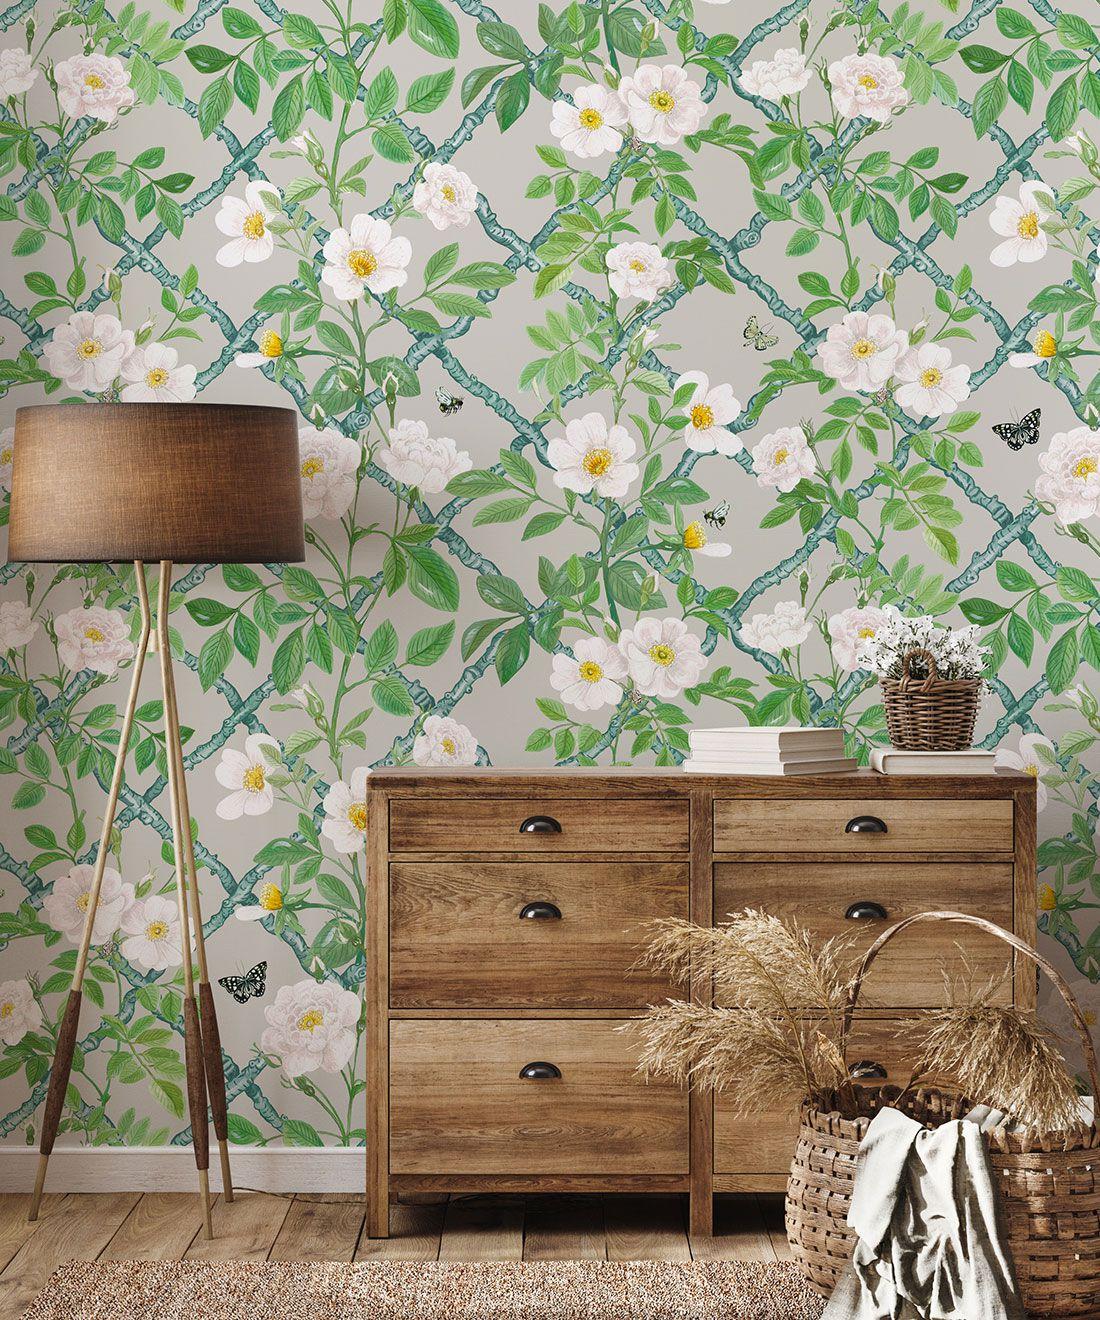 Treilage Wallpaper • Floral Wallpaper • Beige • Insitu